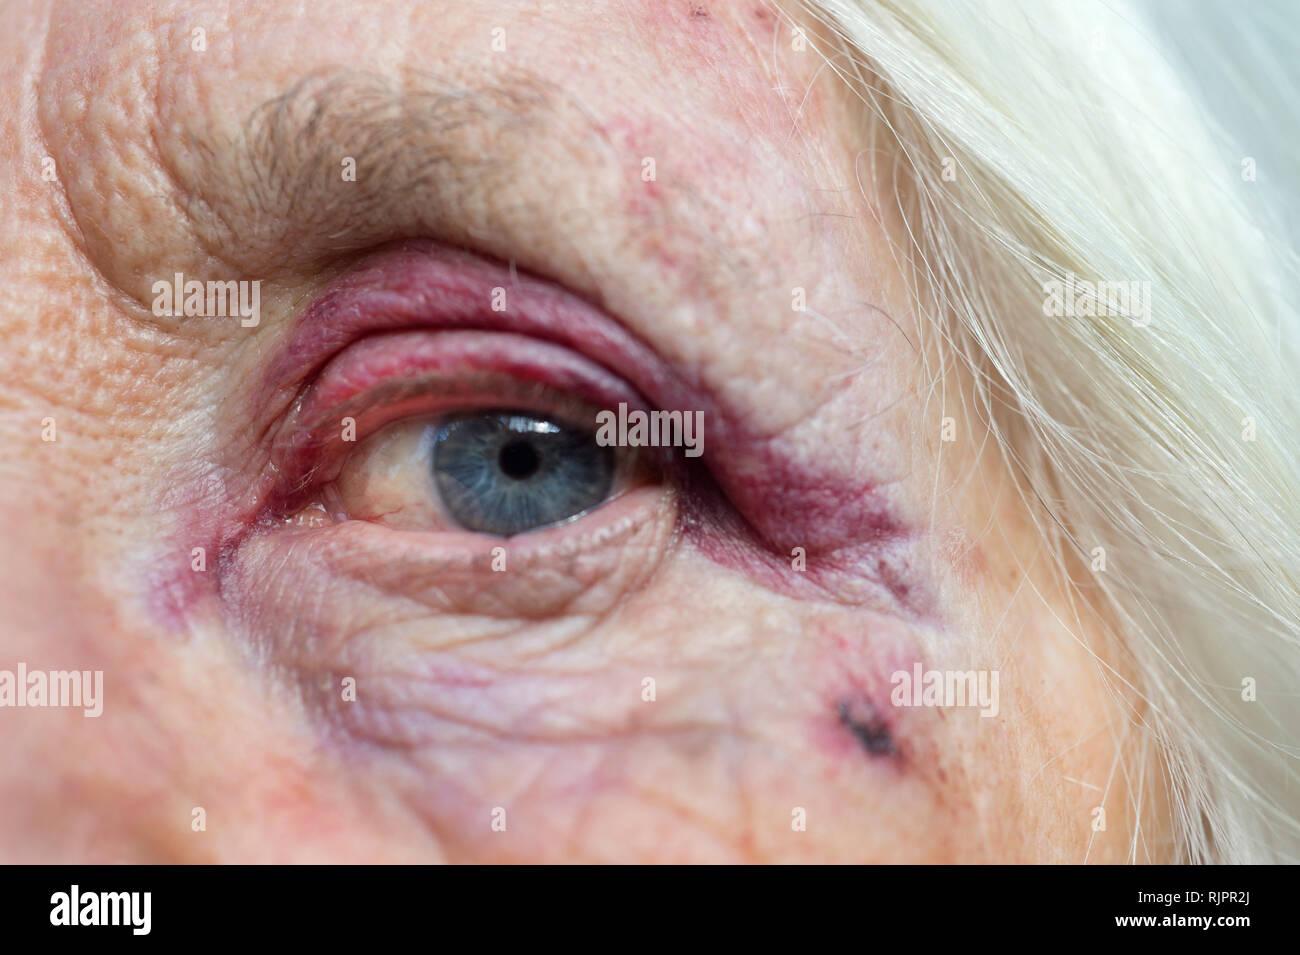 Self portrait with black eye, February 1st 2019 - Stock Image